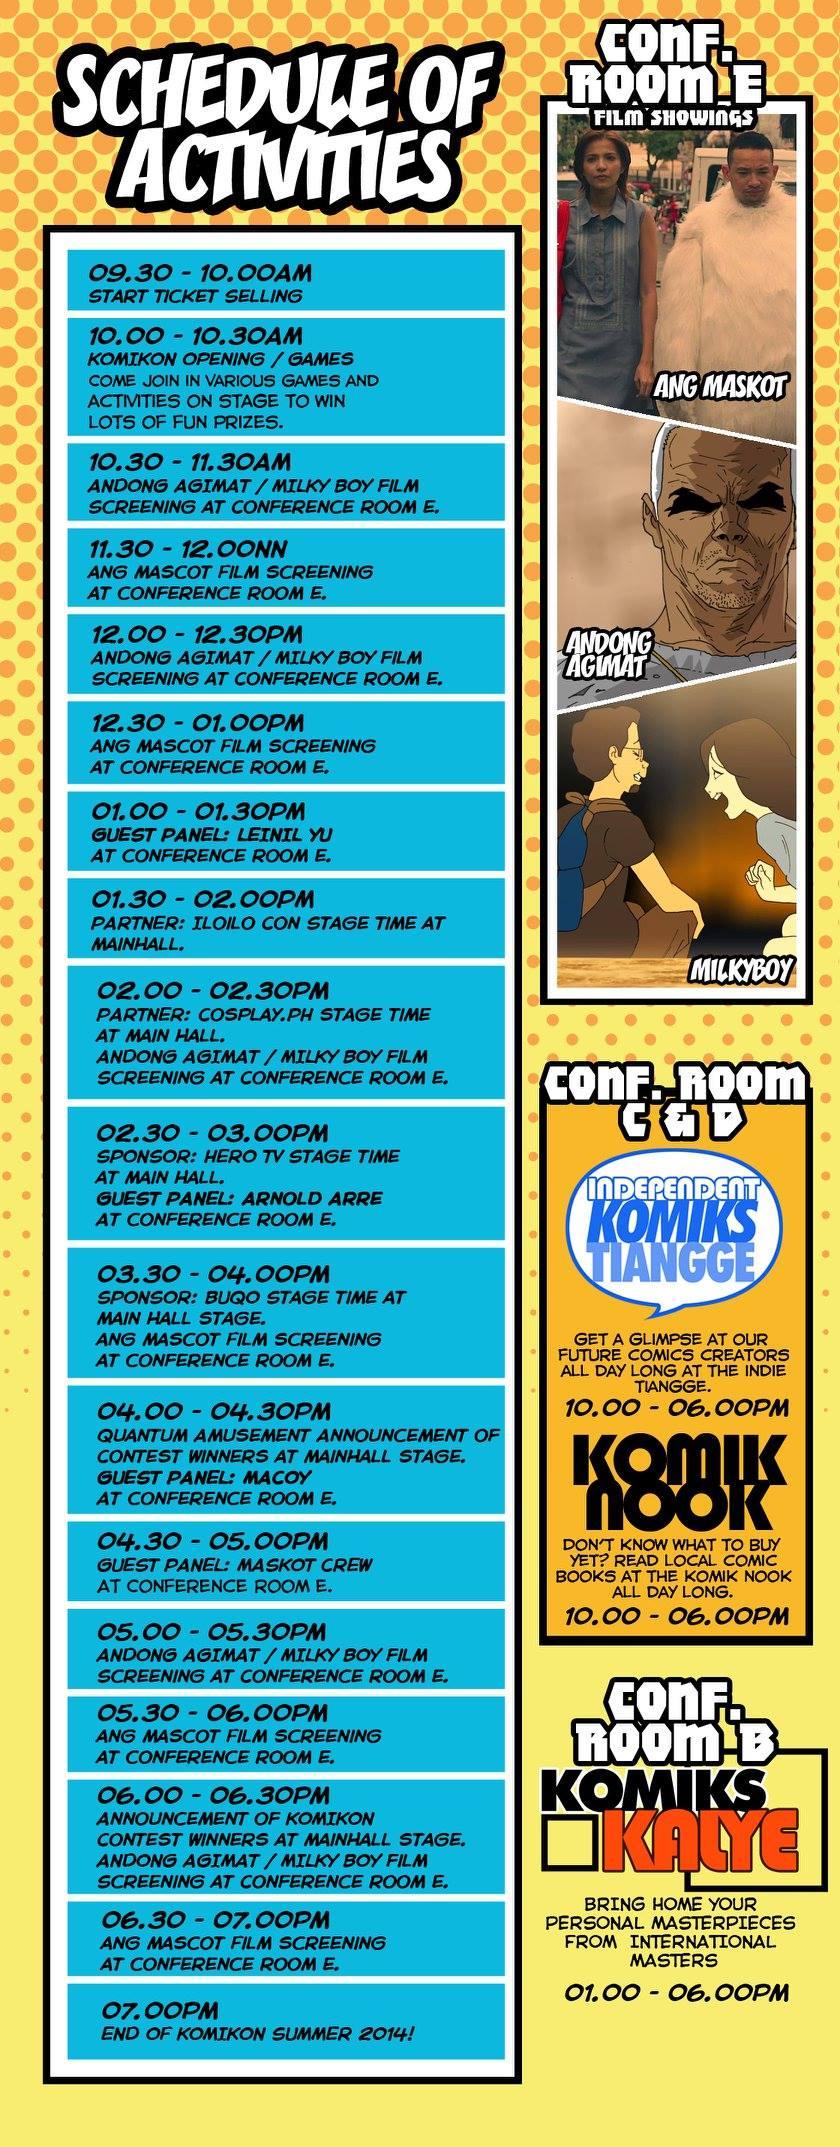 Summer Komikon 2014 Program Schedule